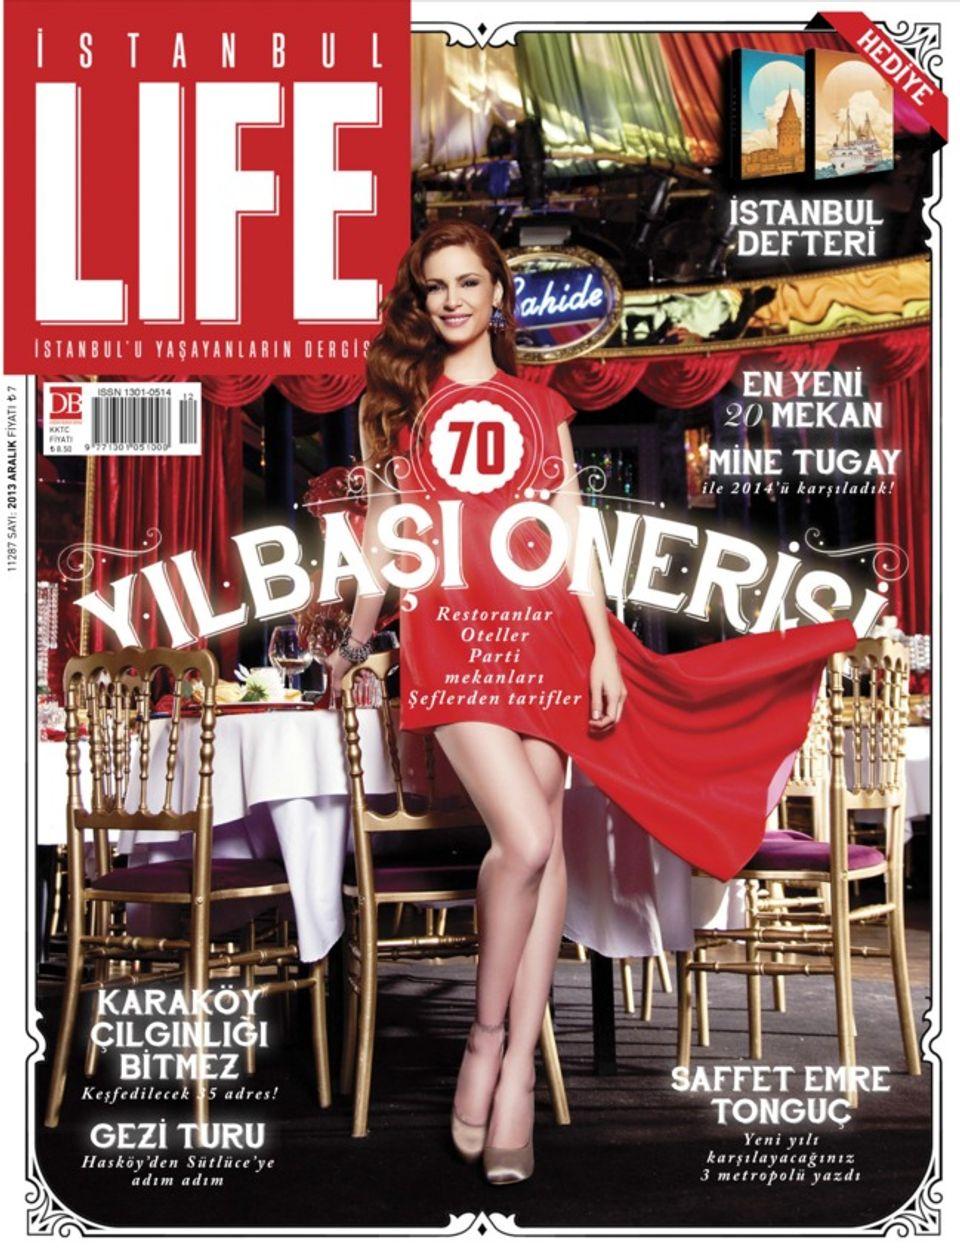 Istanbul Life-December 2013 Magazine - Get your Digital